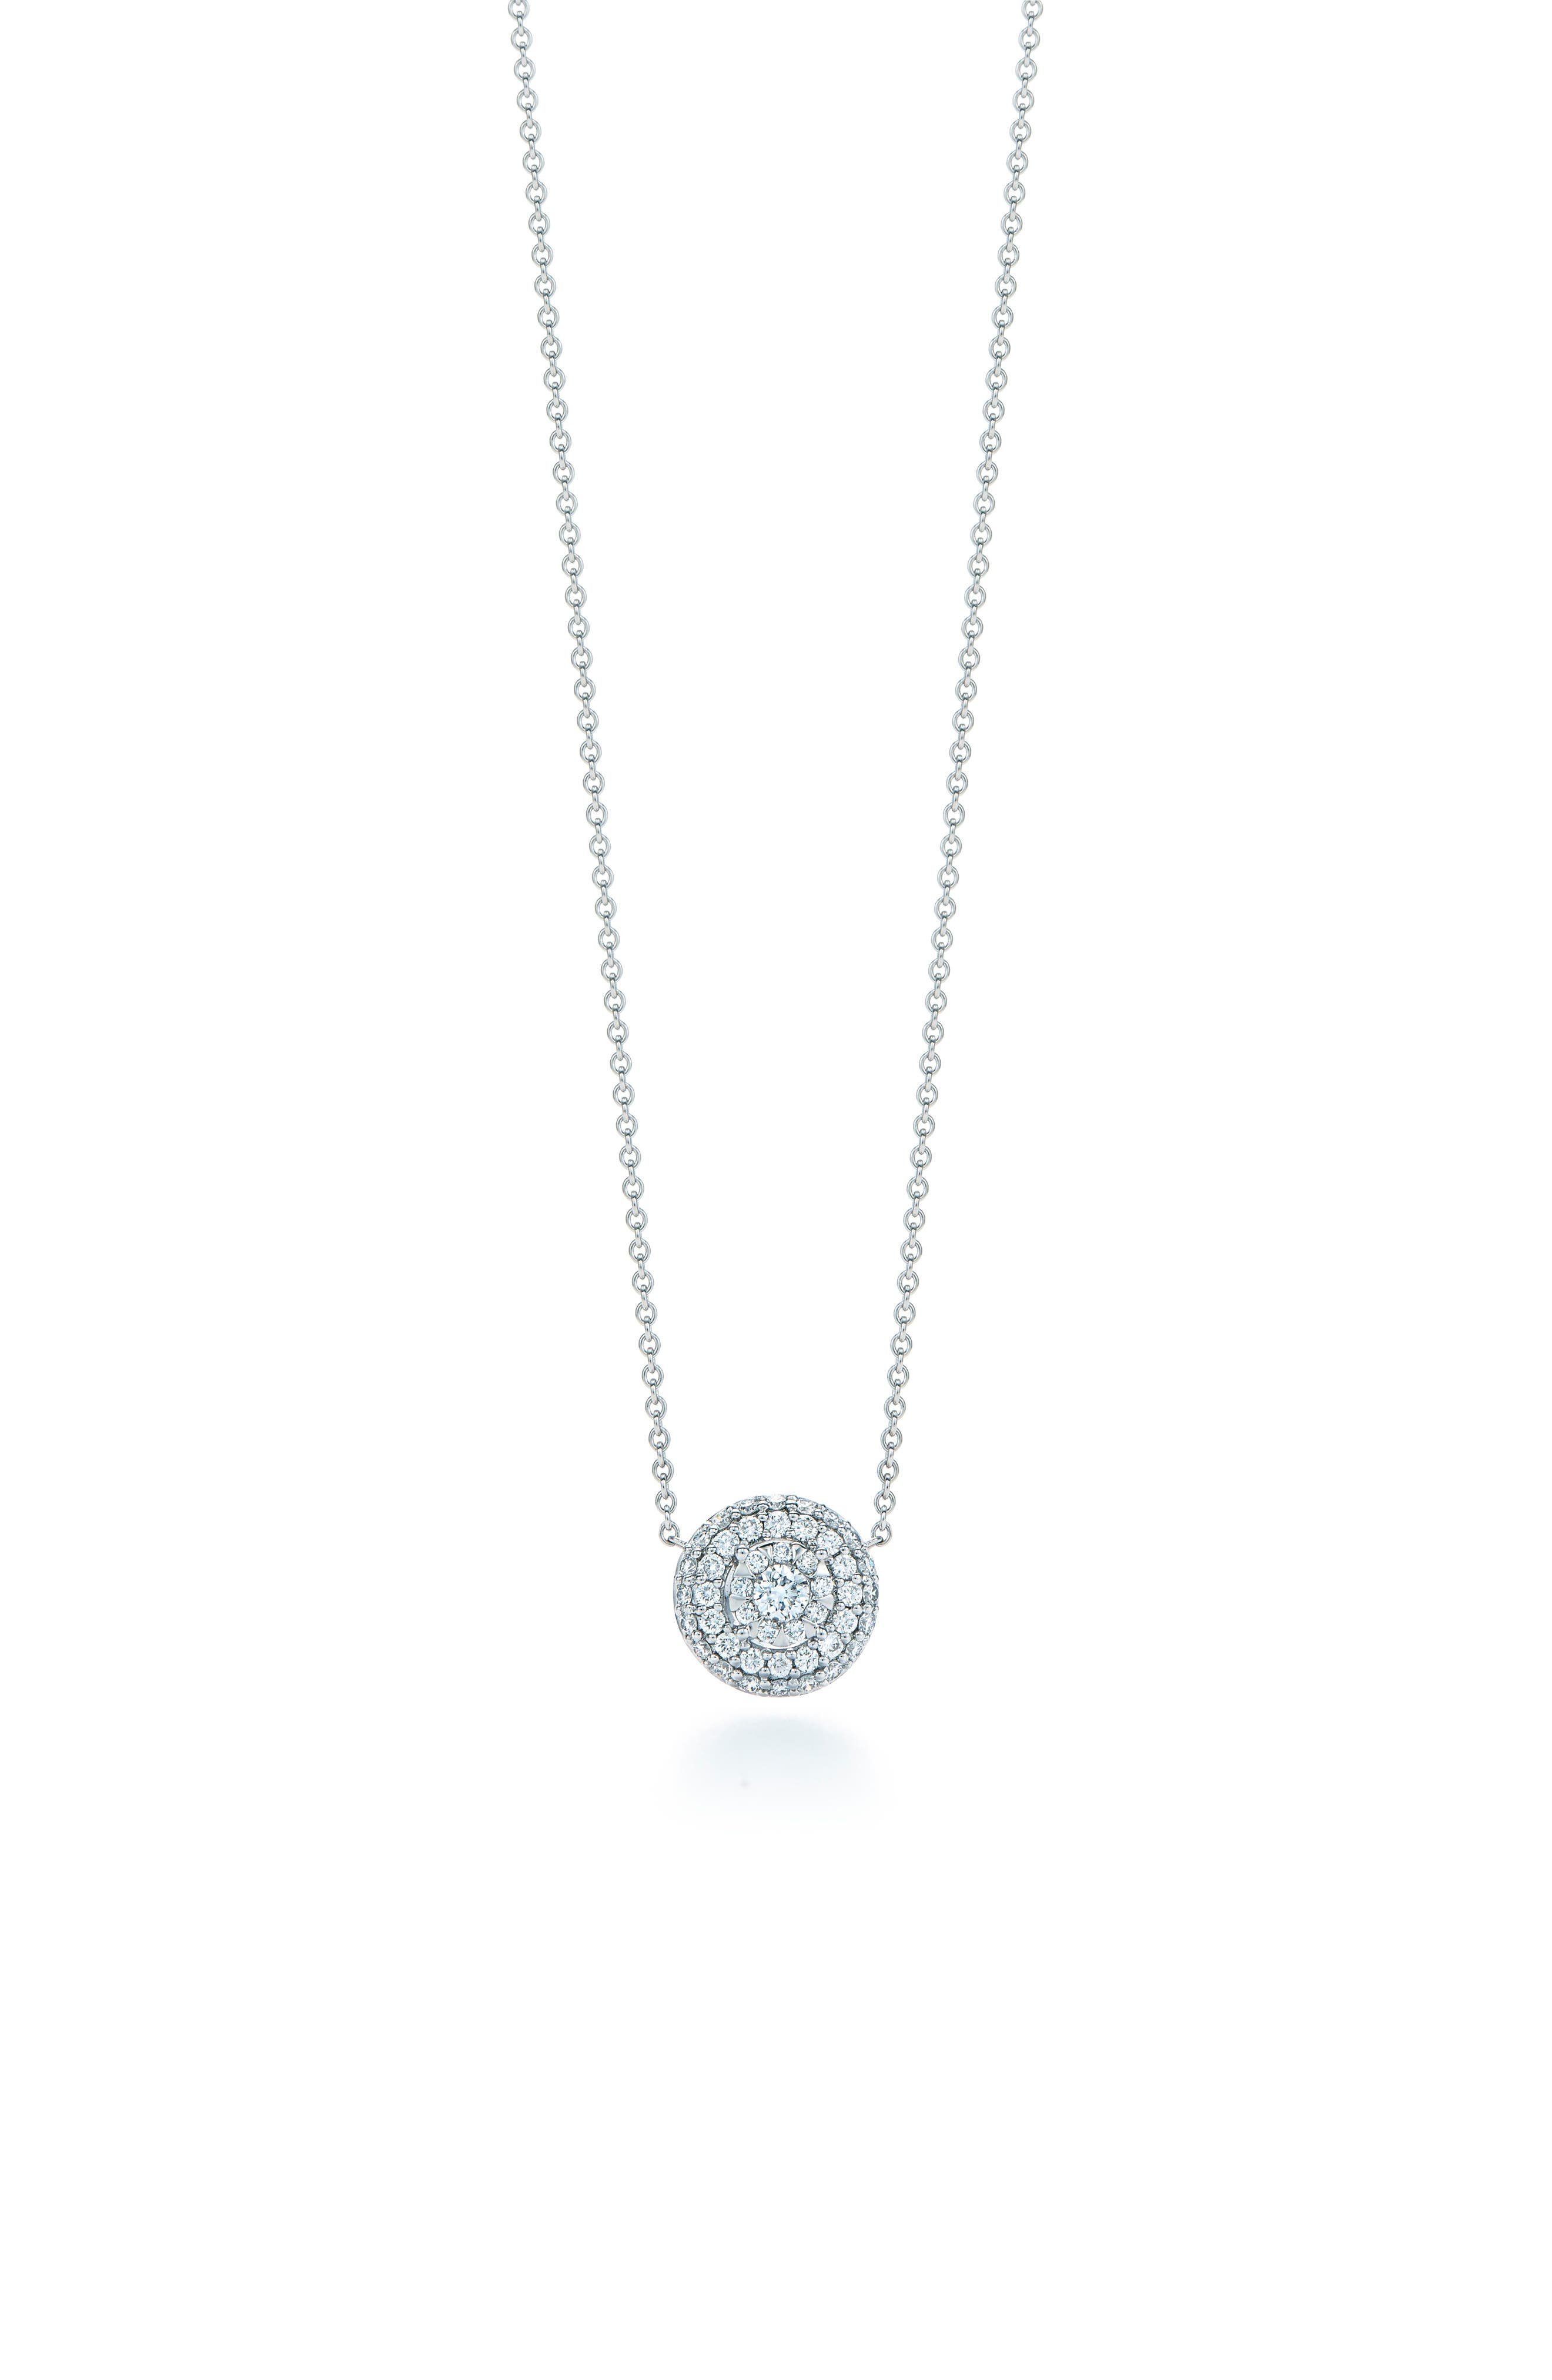 Main Image - Kwiat Sunburst Pavé Diamond Double Halo Pendant Necklace